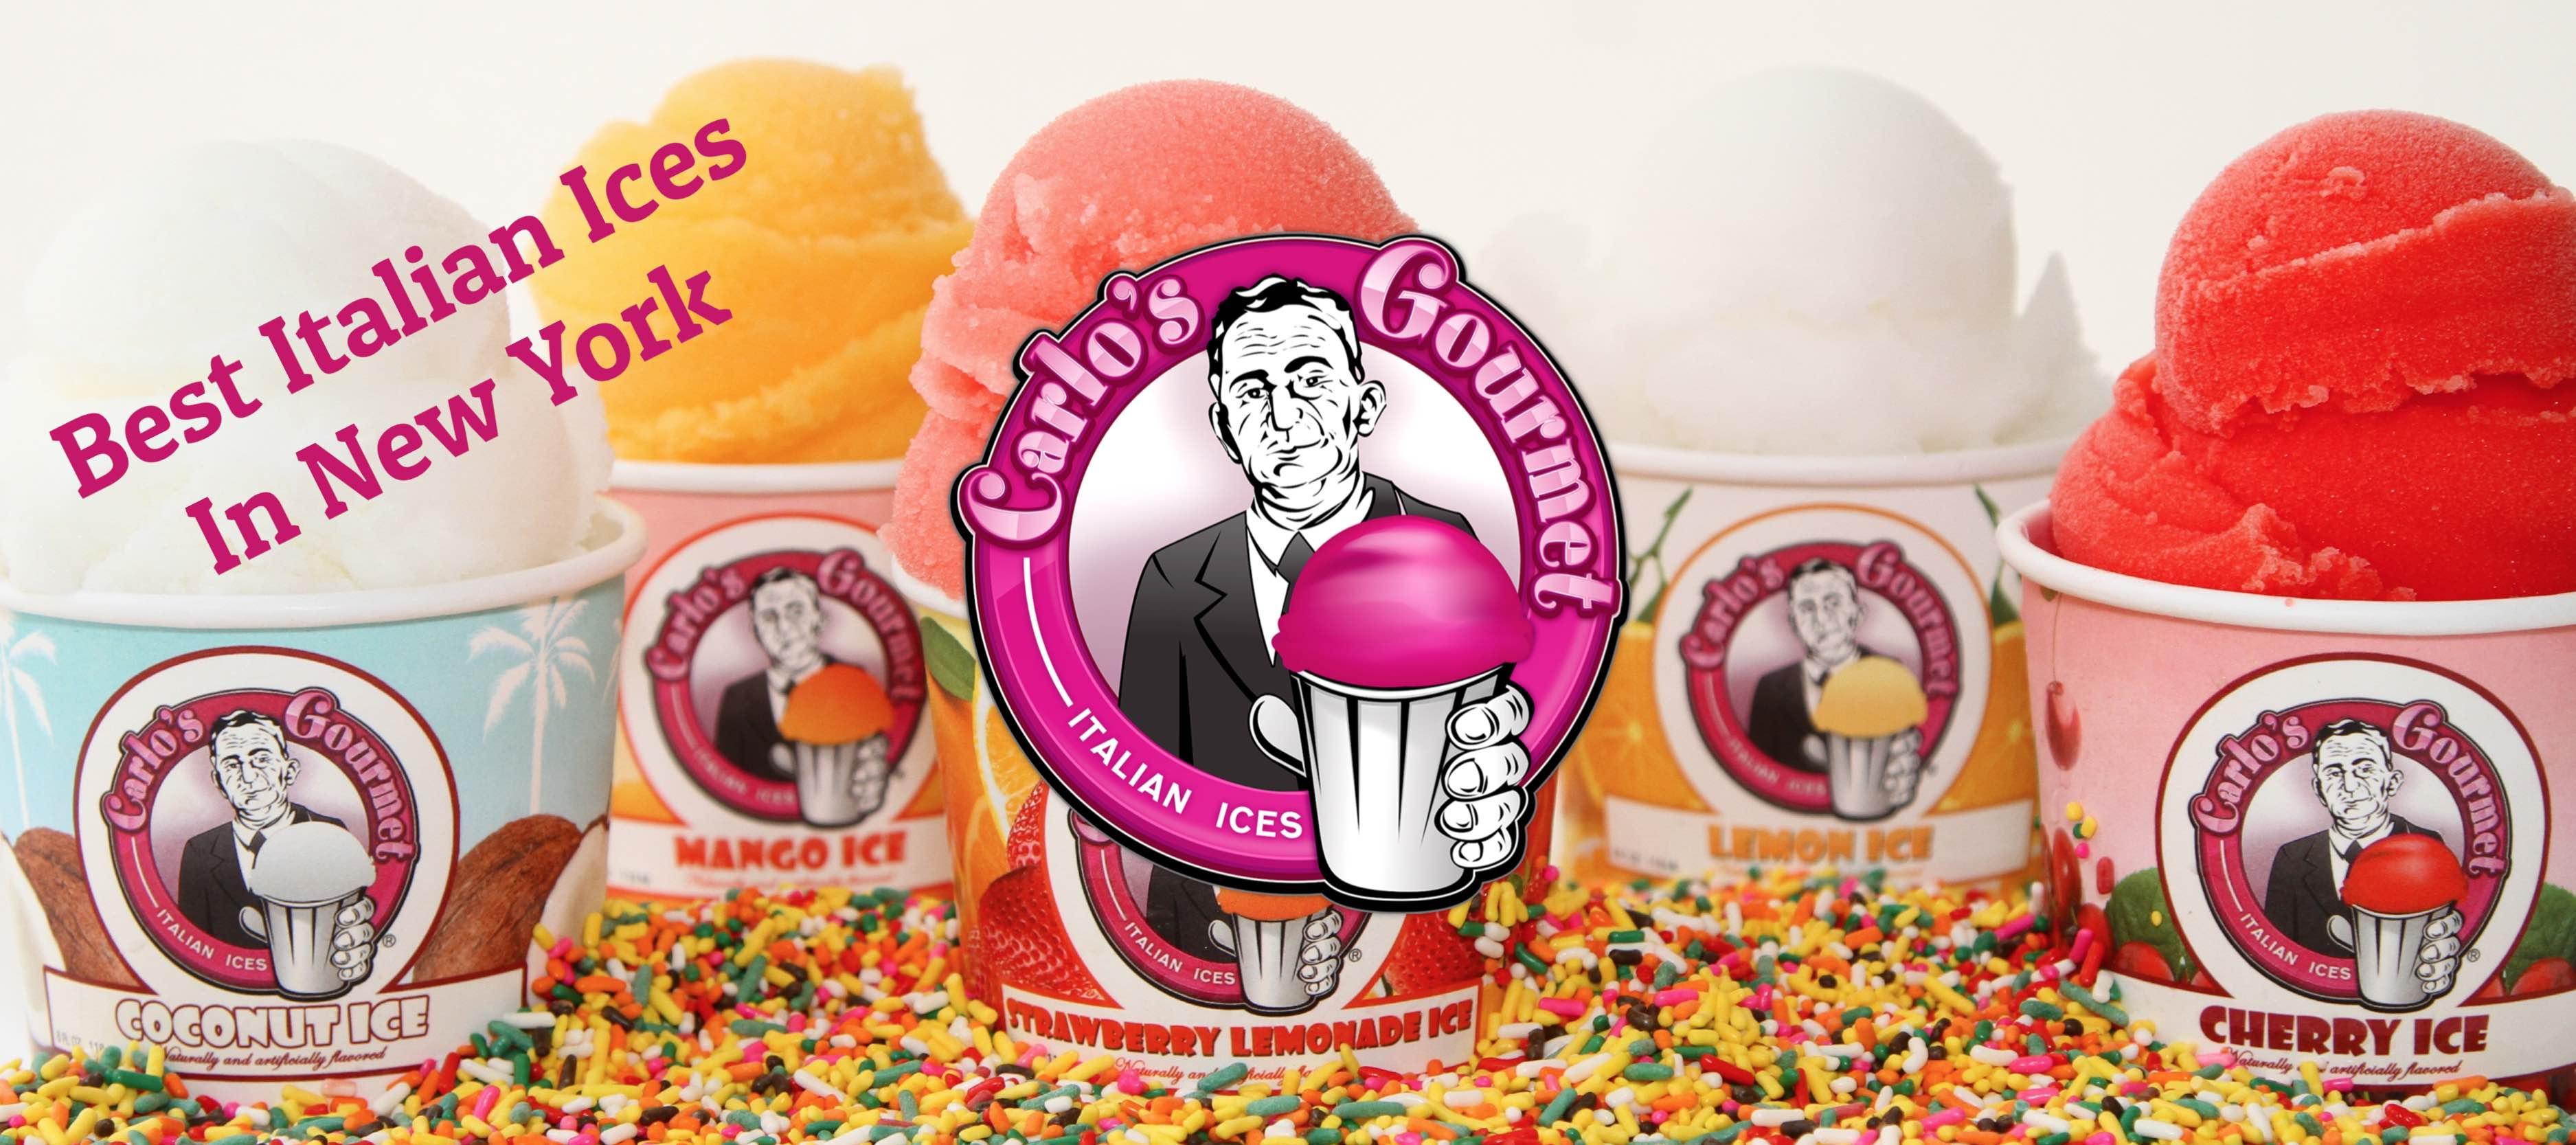 Wholesalers | Best Italian Ices in New York